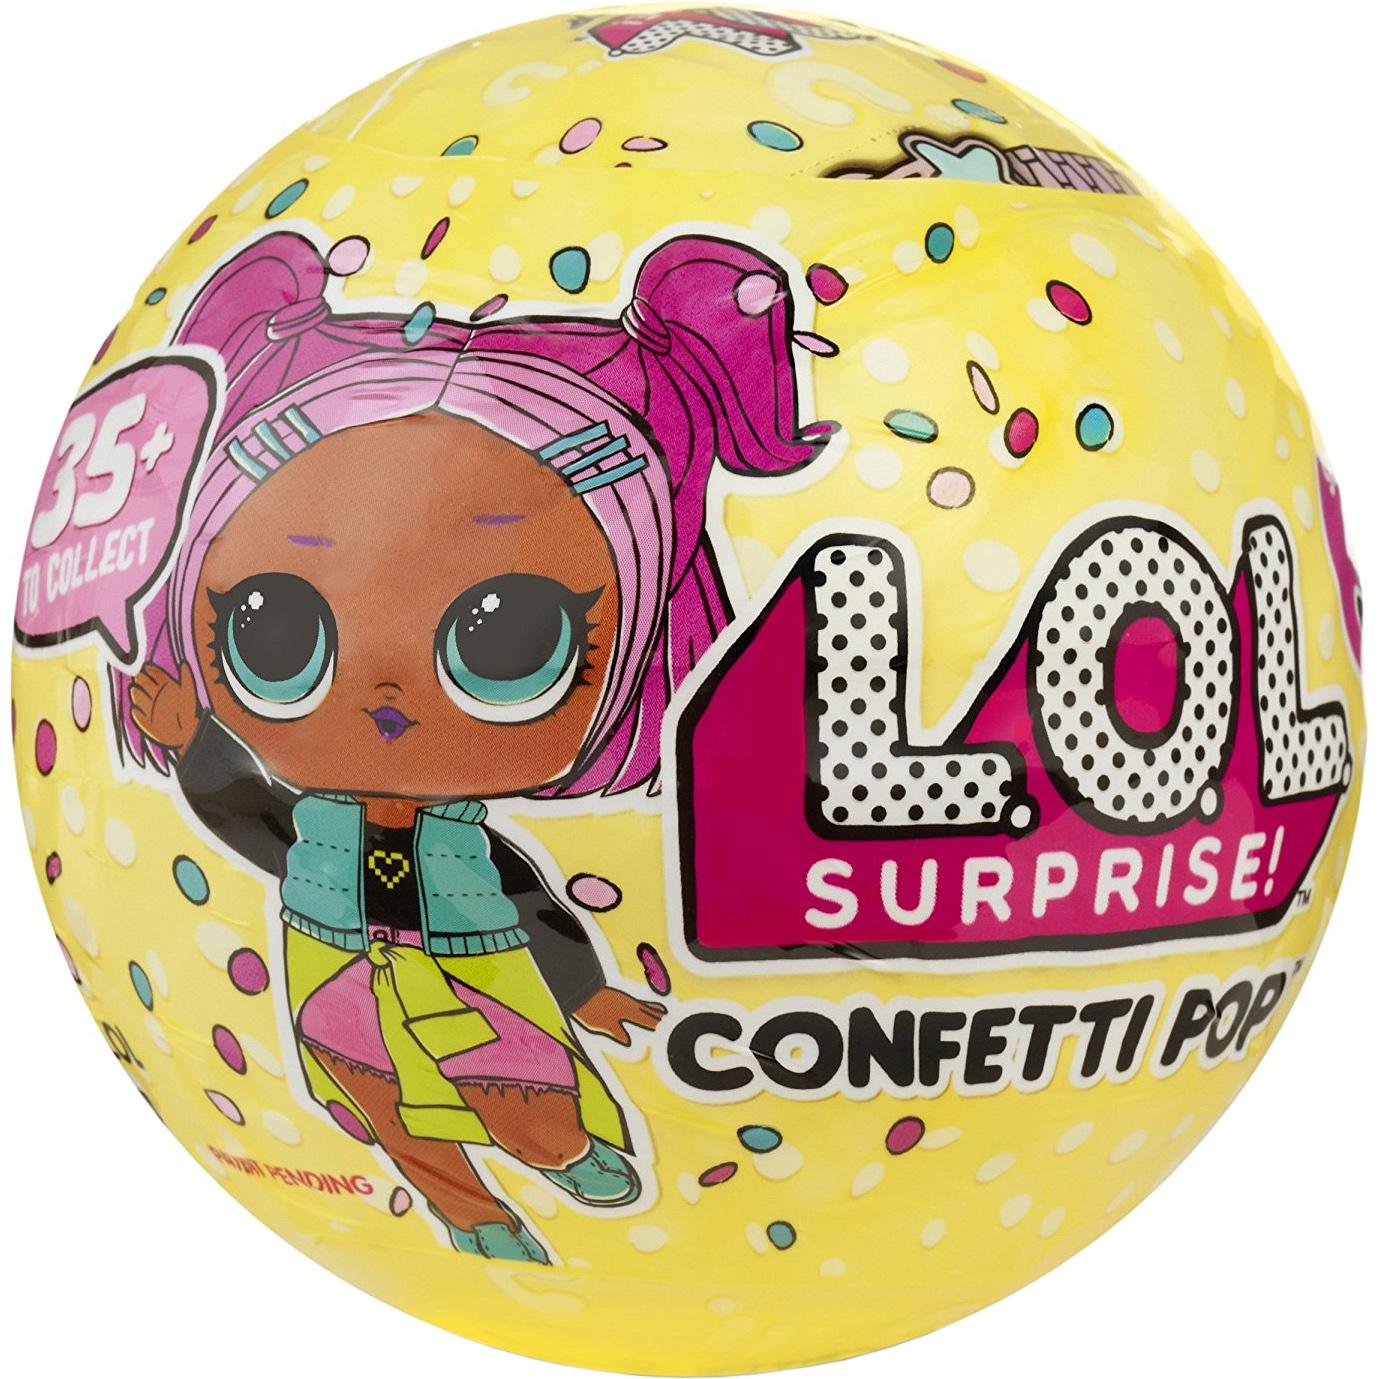 Купить Кукла L.O.L. Surprise Confetti POP Serie 3, Lol, Куклы и пупсы